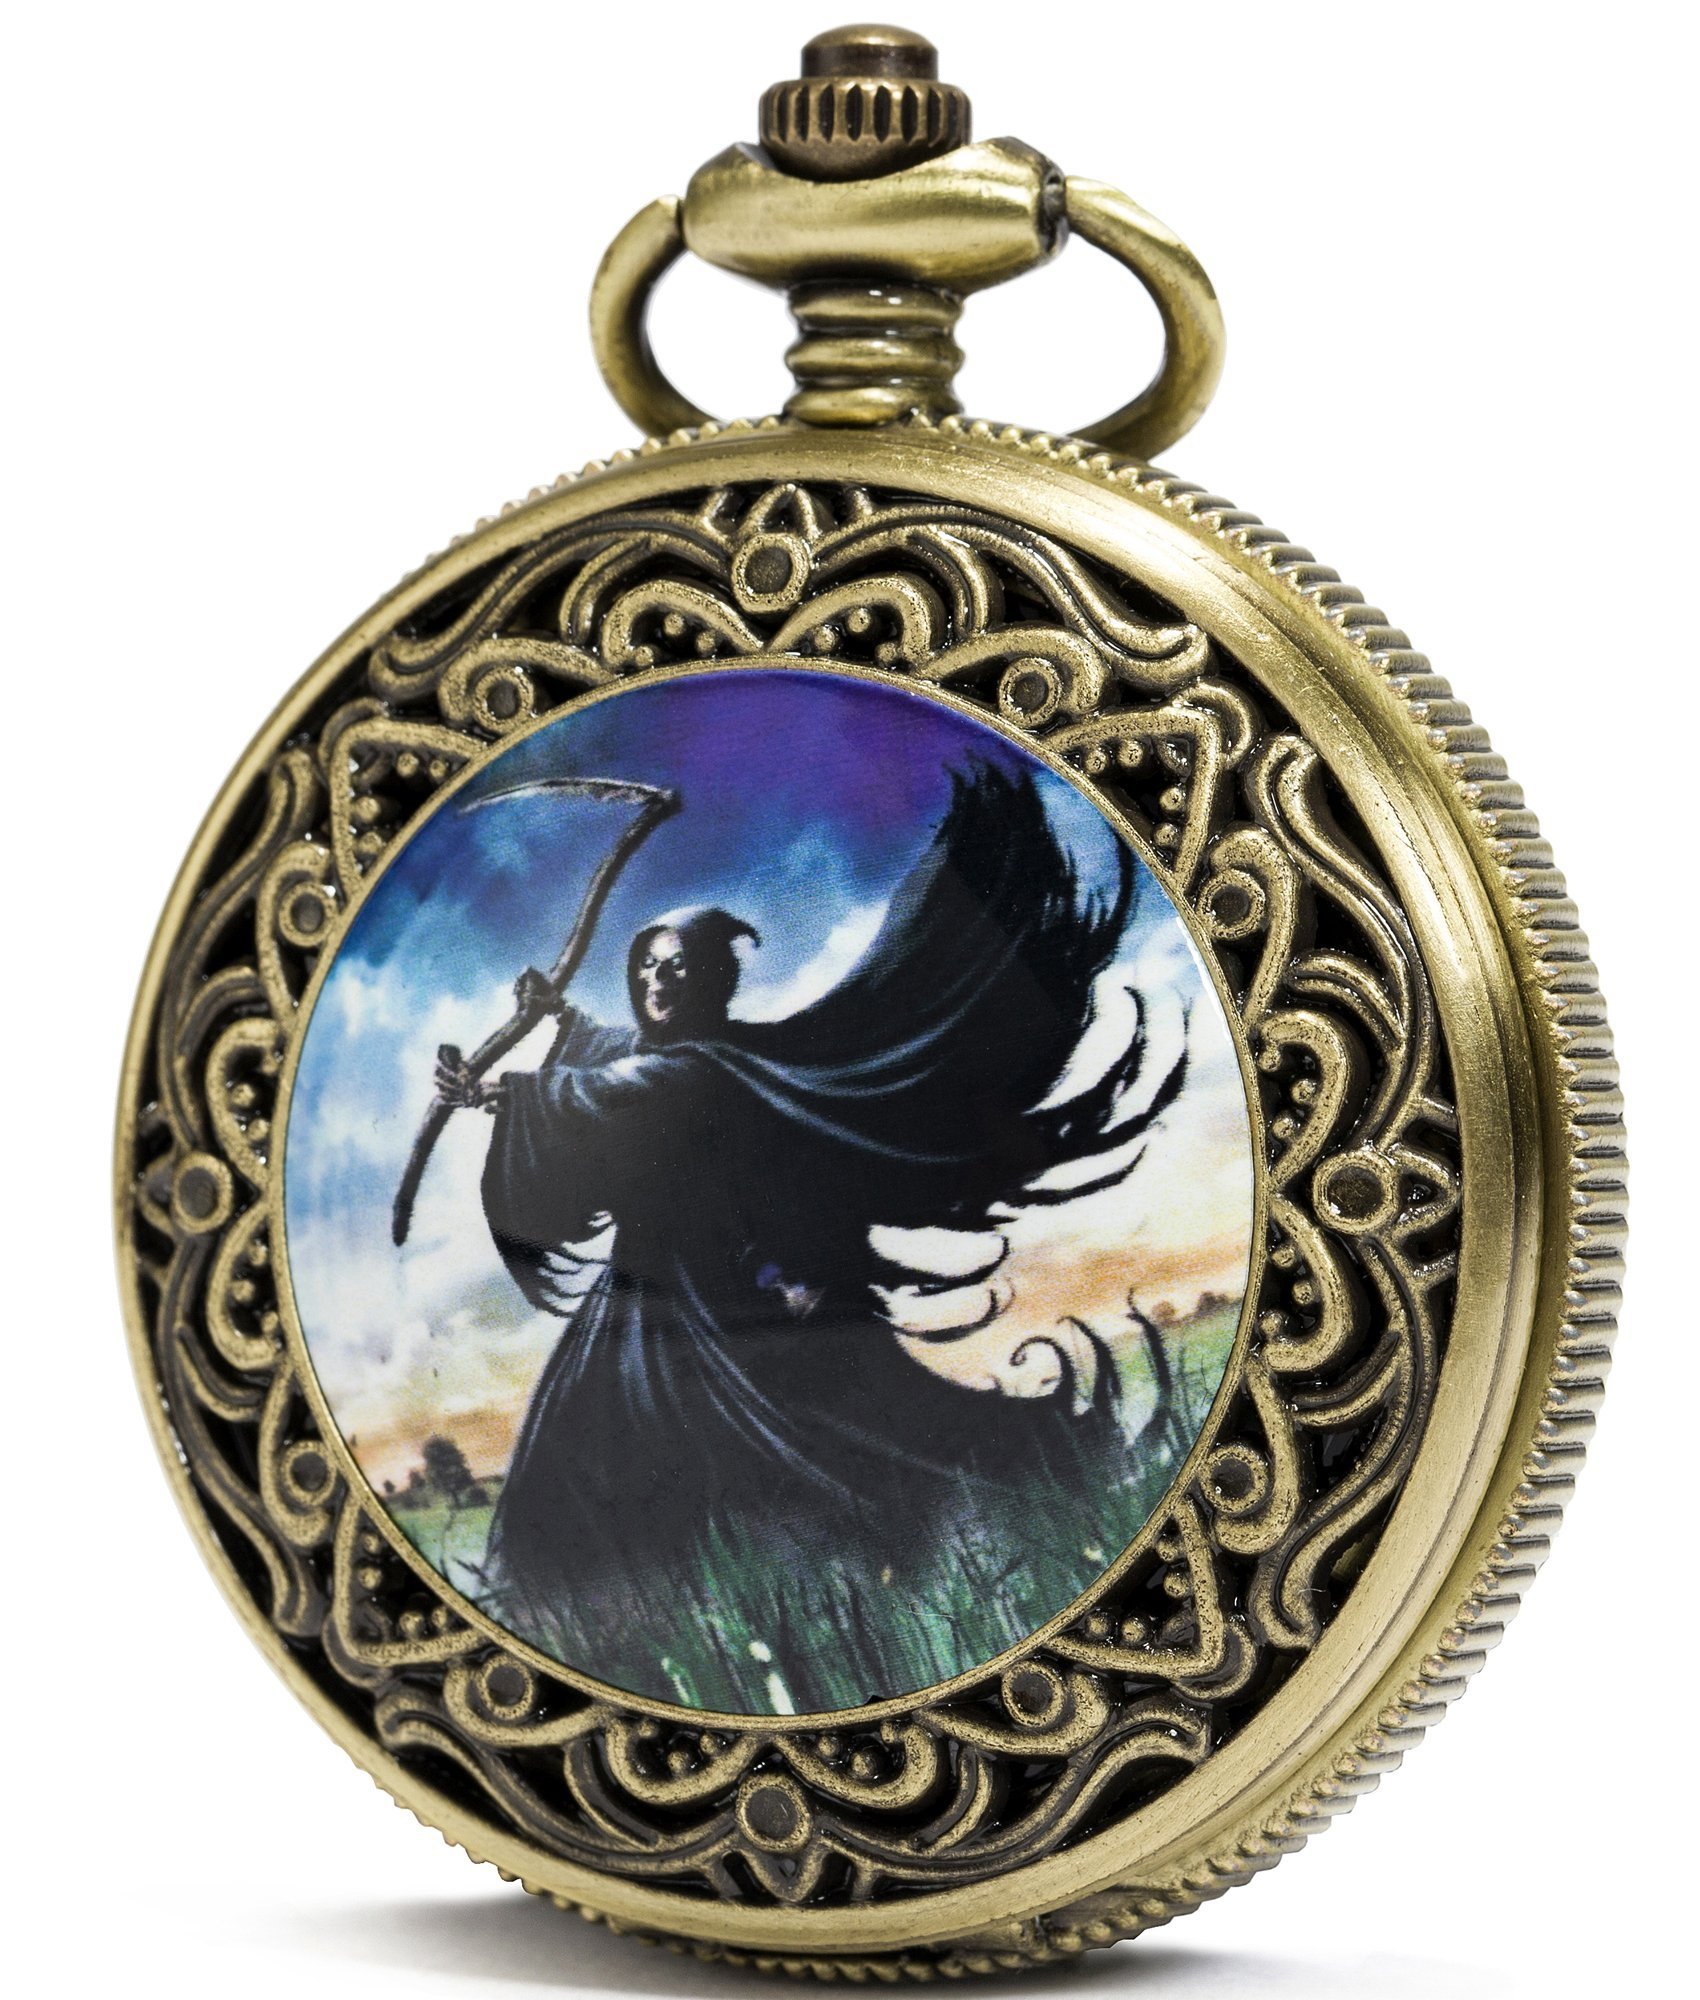 SEWOR Fashion Bronze Quartz Enamel Painting Pocket Watch Black Dial + Leather Gift Box (Death cemetery)